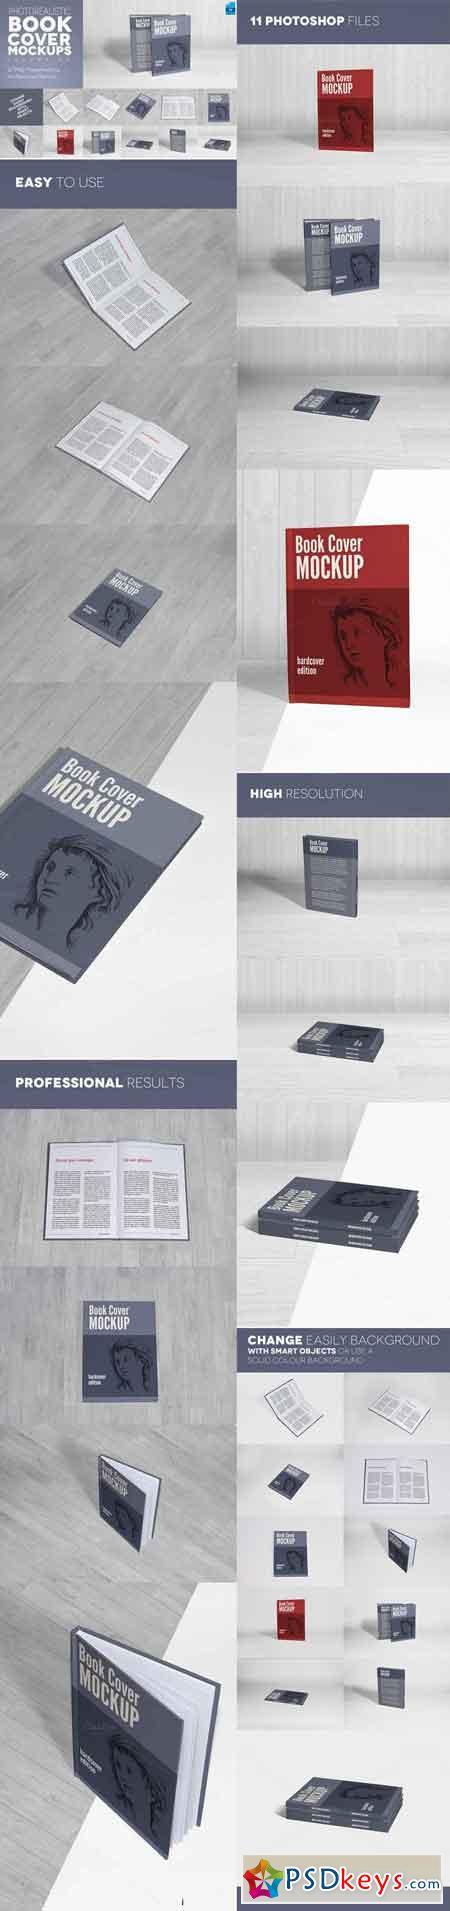 Book Cover Mockups v5 - Hardcover 418715